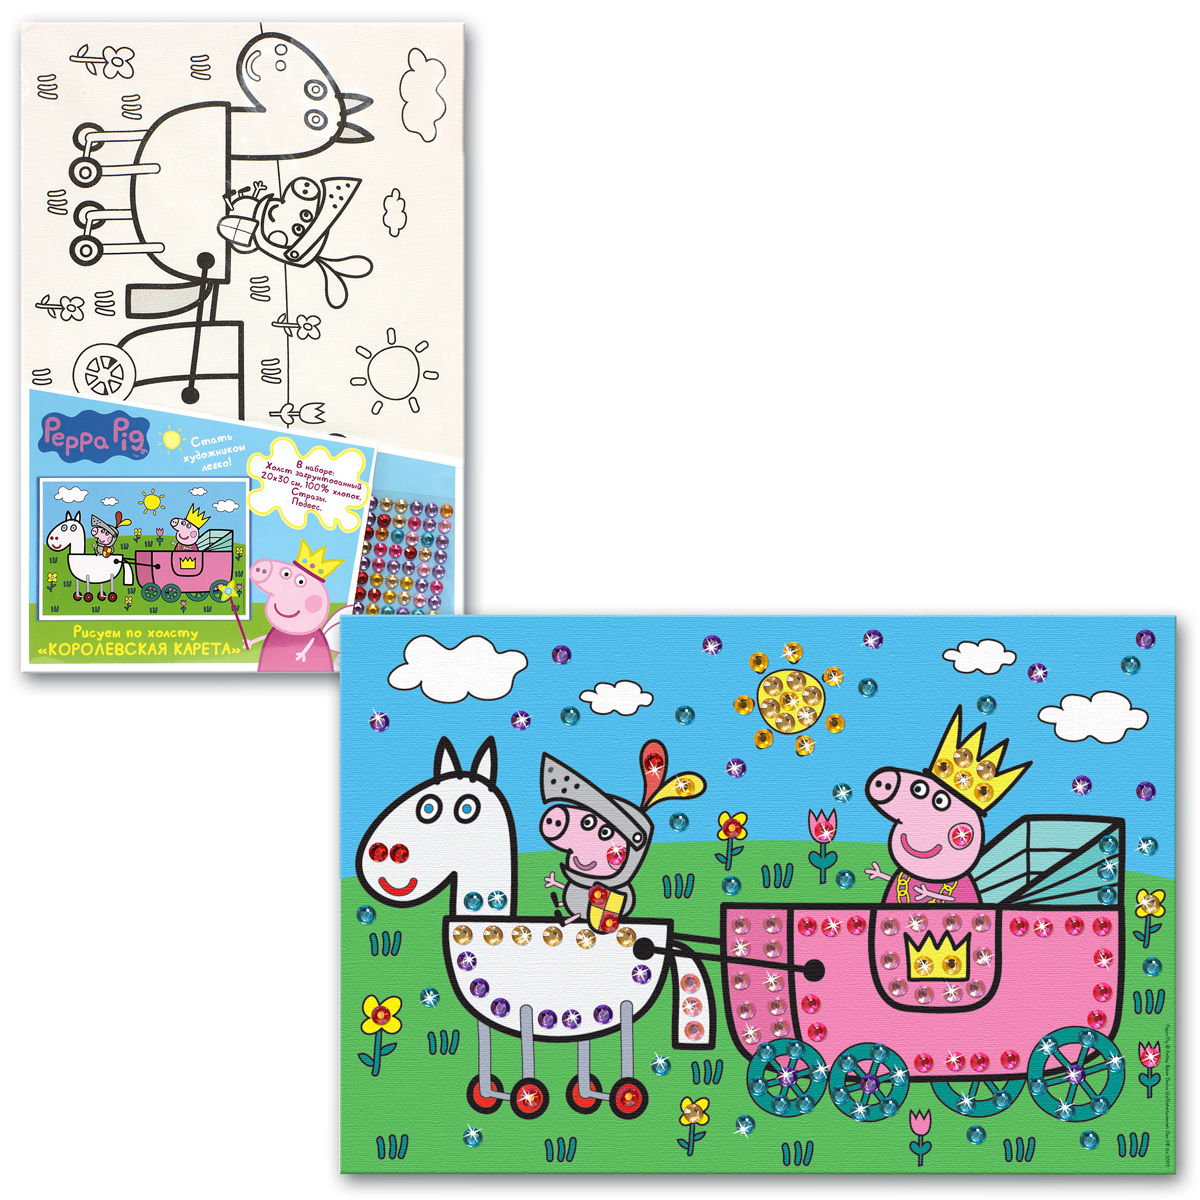 Рисуем по холсту Peppa - Королевская карета, со стразами, 20 х 30Свинка Пеппа (Peppa Pig )<br>Рисуем по холсту Peppa - Королевская карета, со стразами, 20 х 30<br>